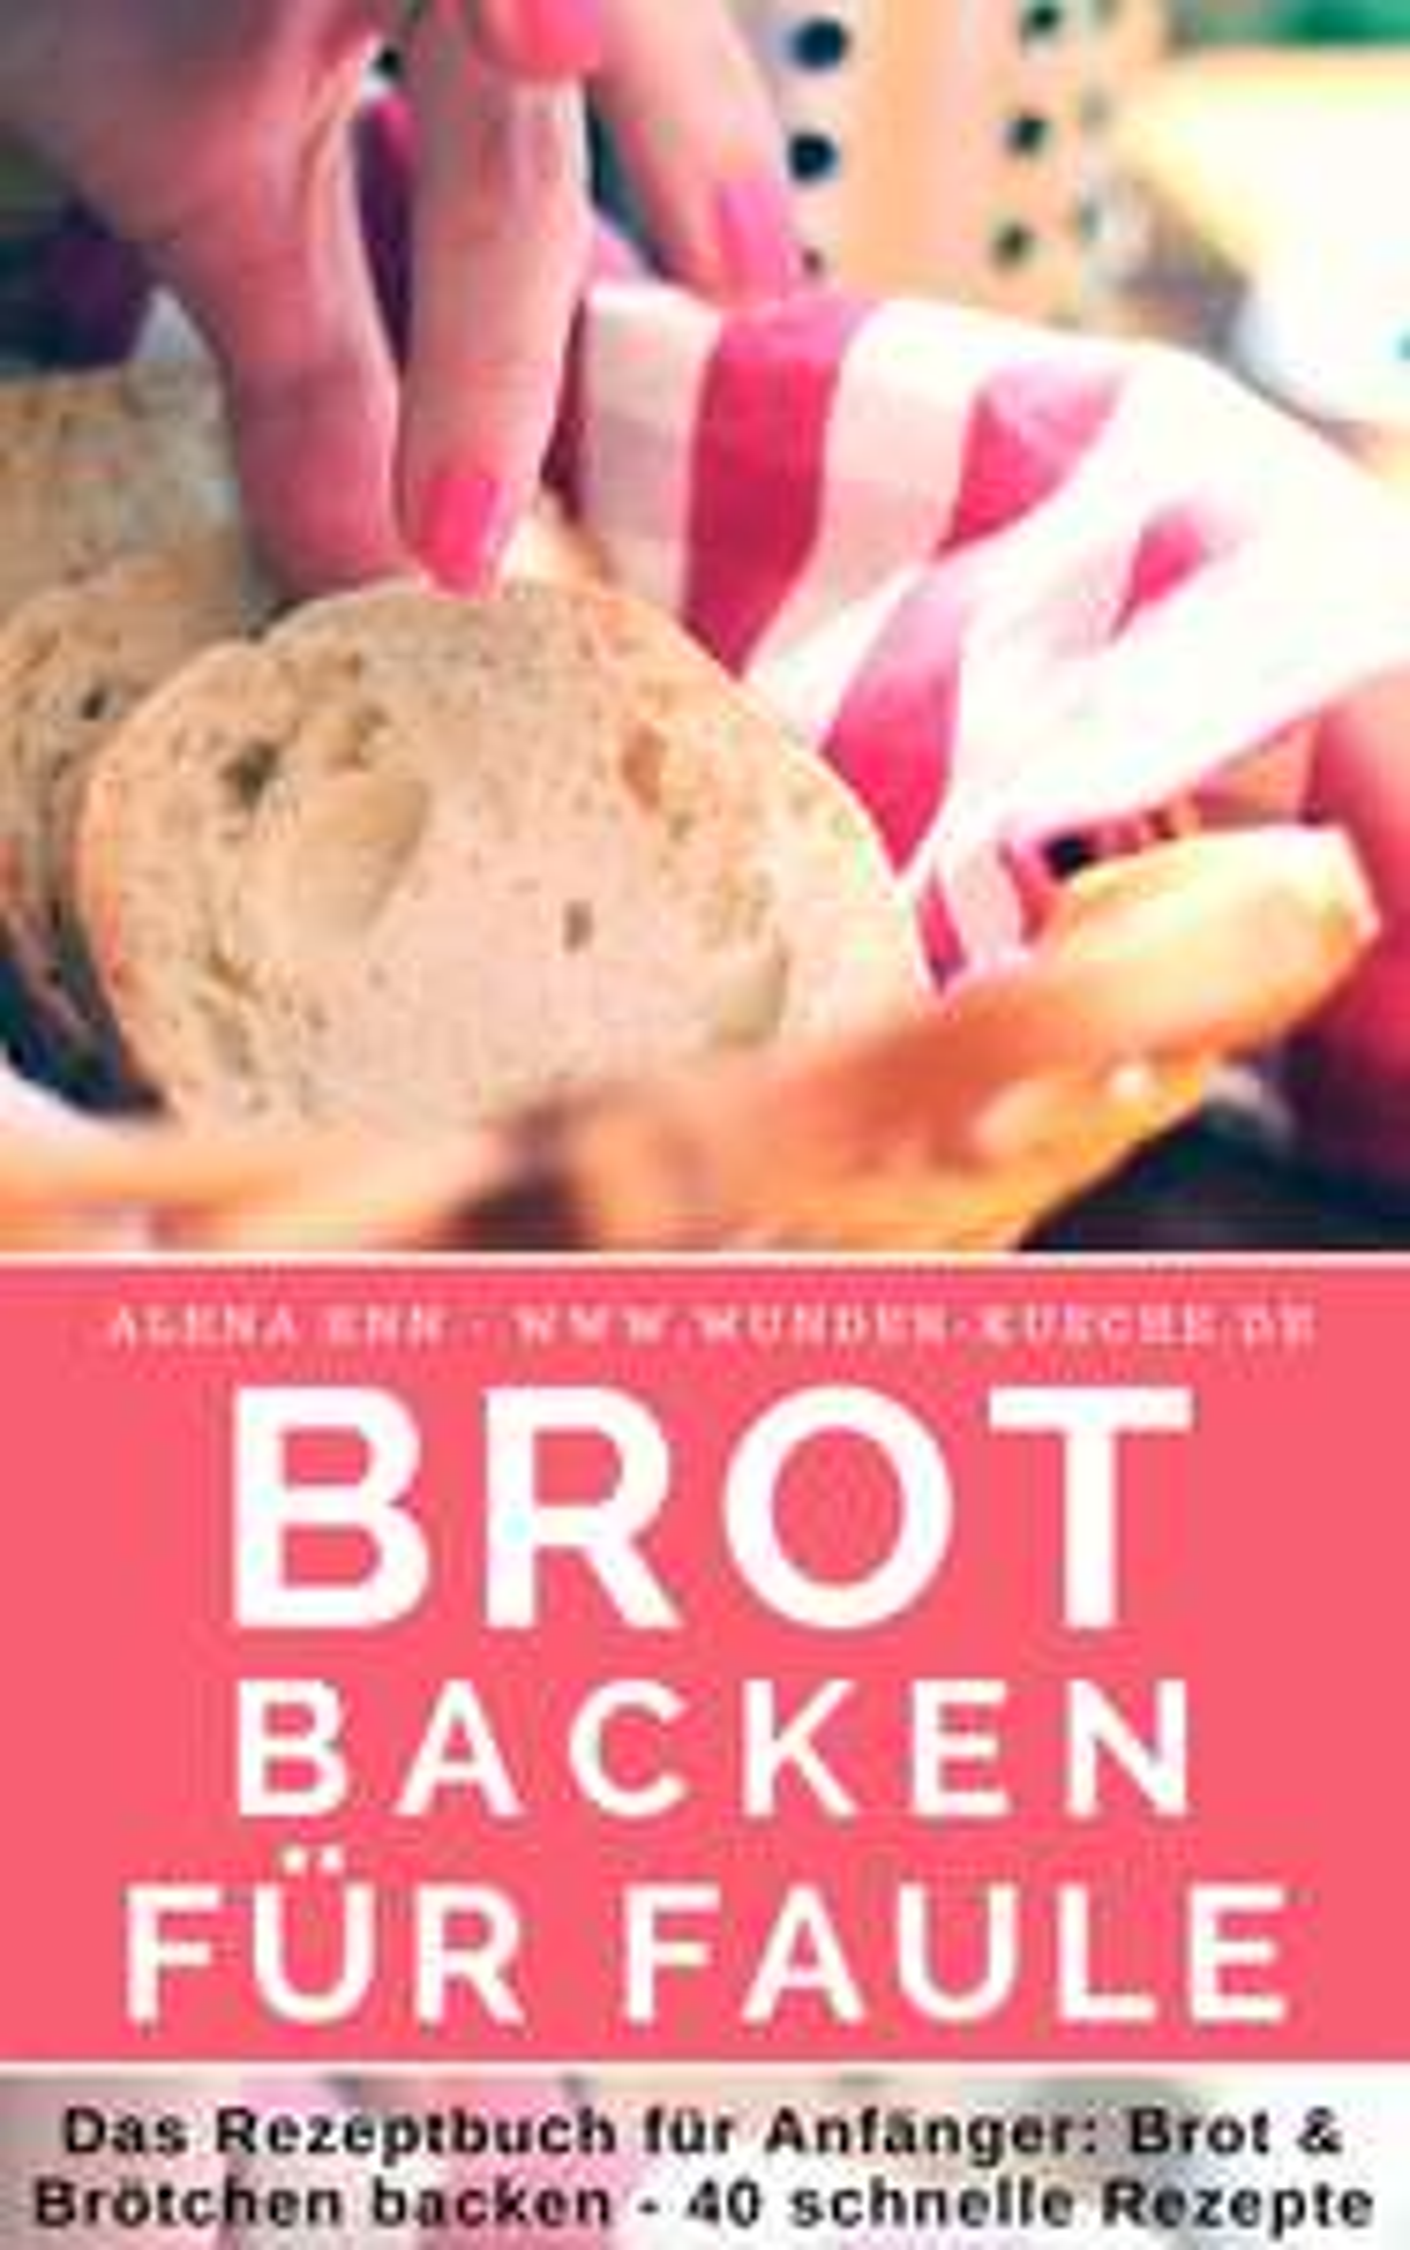 Hobbybäcker aufgepasst: eKochbücher rund ums Brotbacken gratis (statt 2,99€)